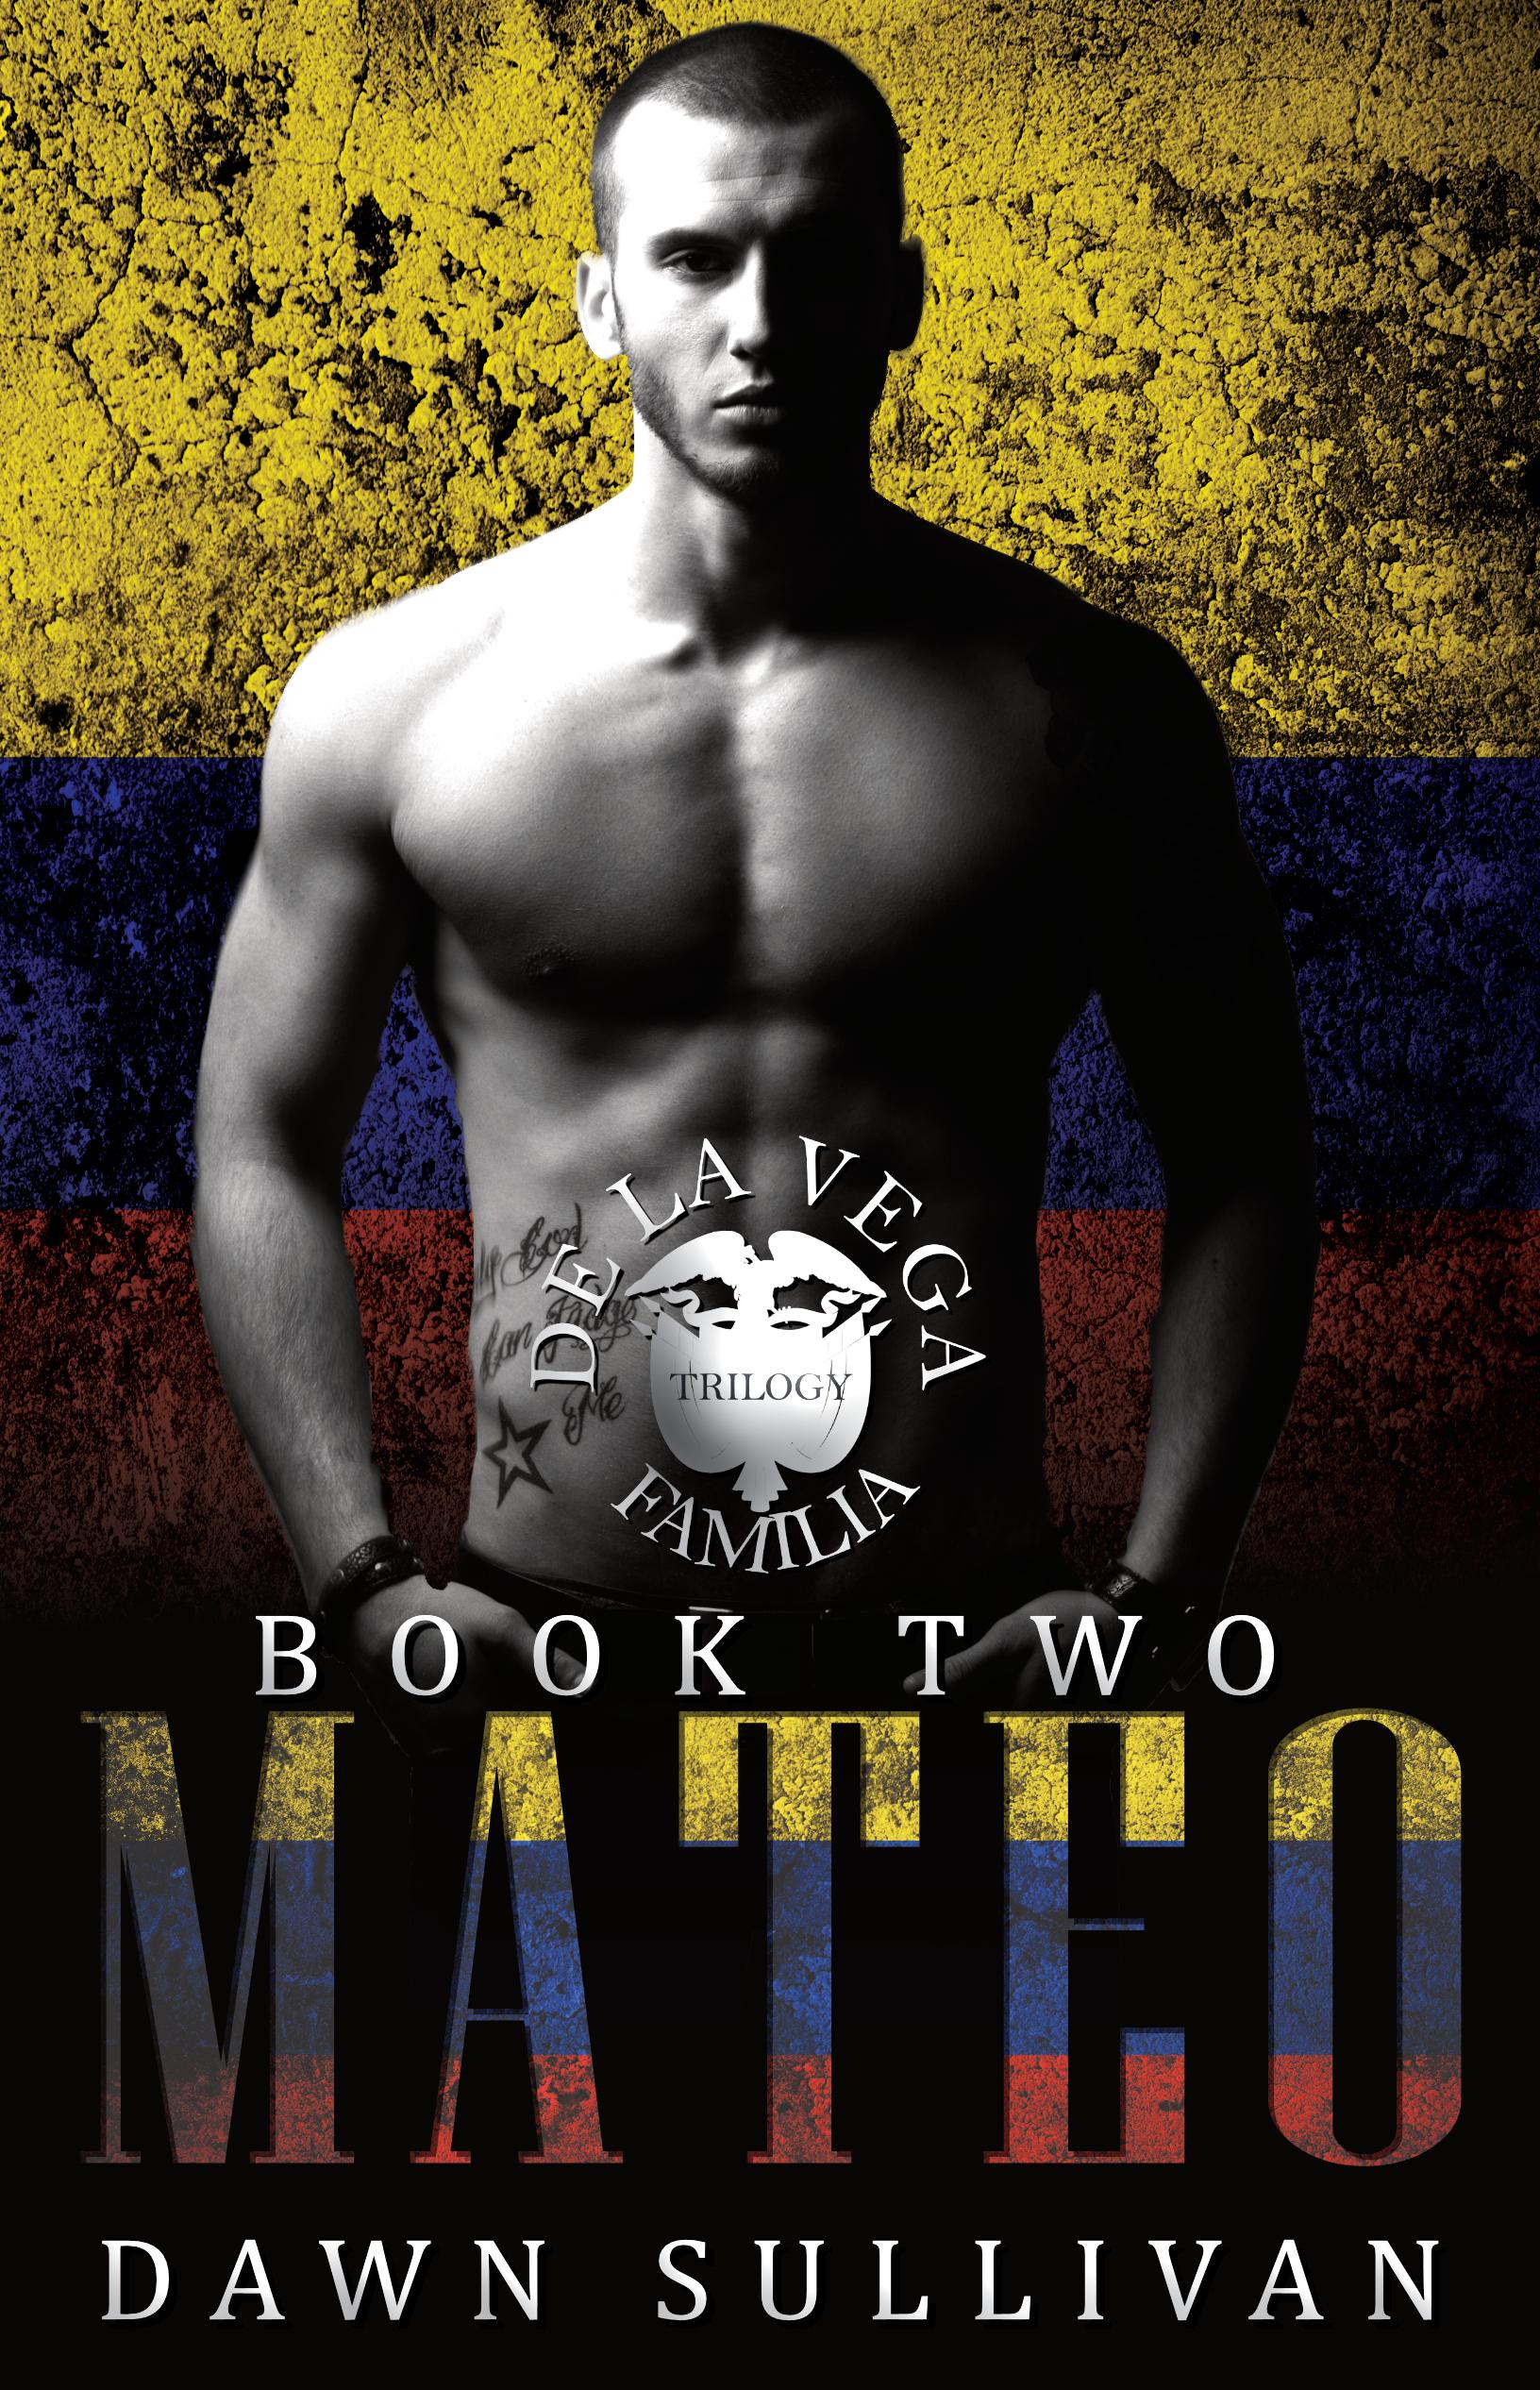 MATEO EBOOK COVER